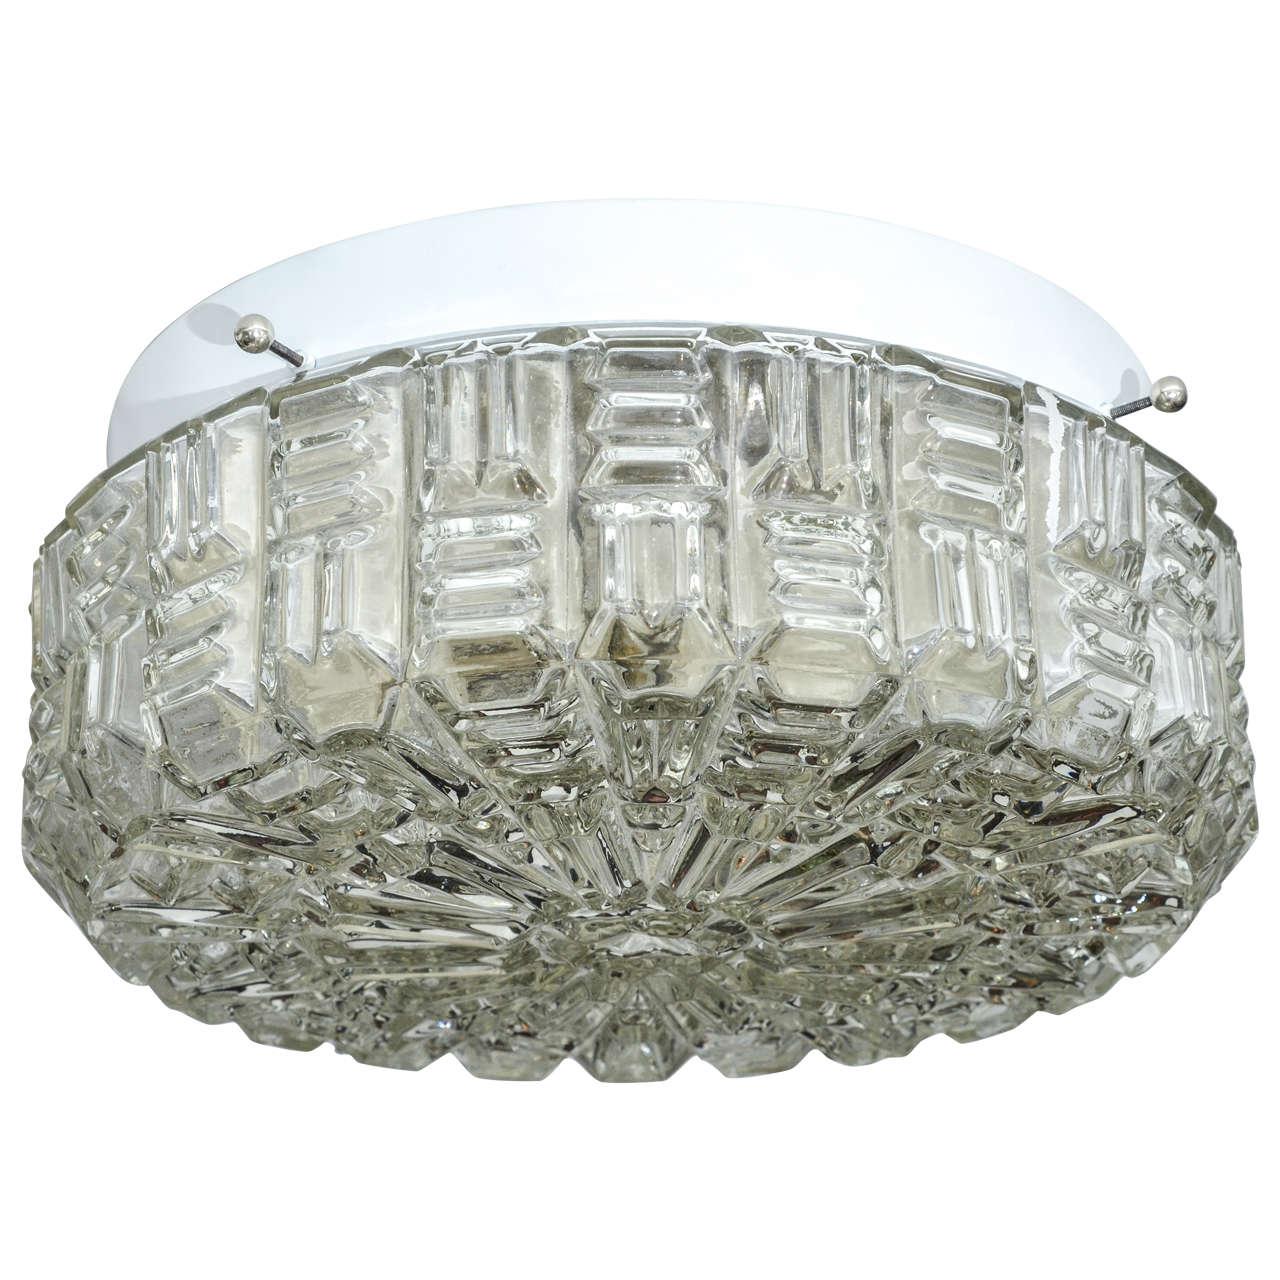 Clear Textured Glass Flush Mount Ceiling Fixture